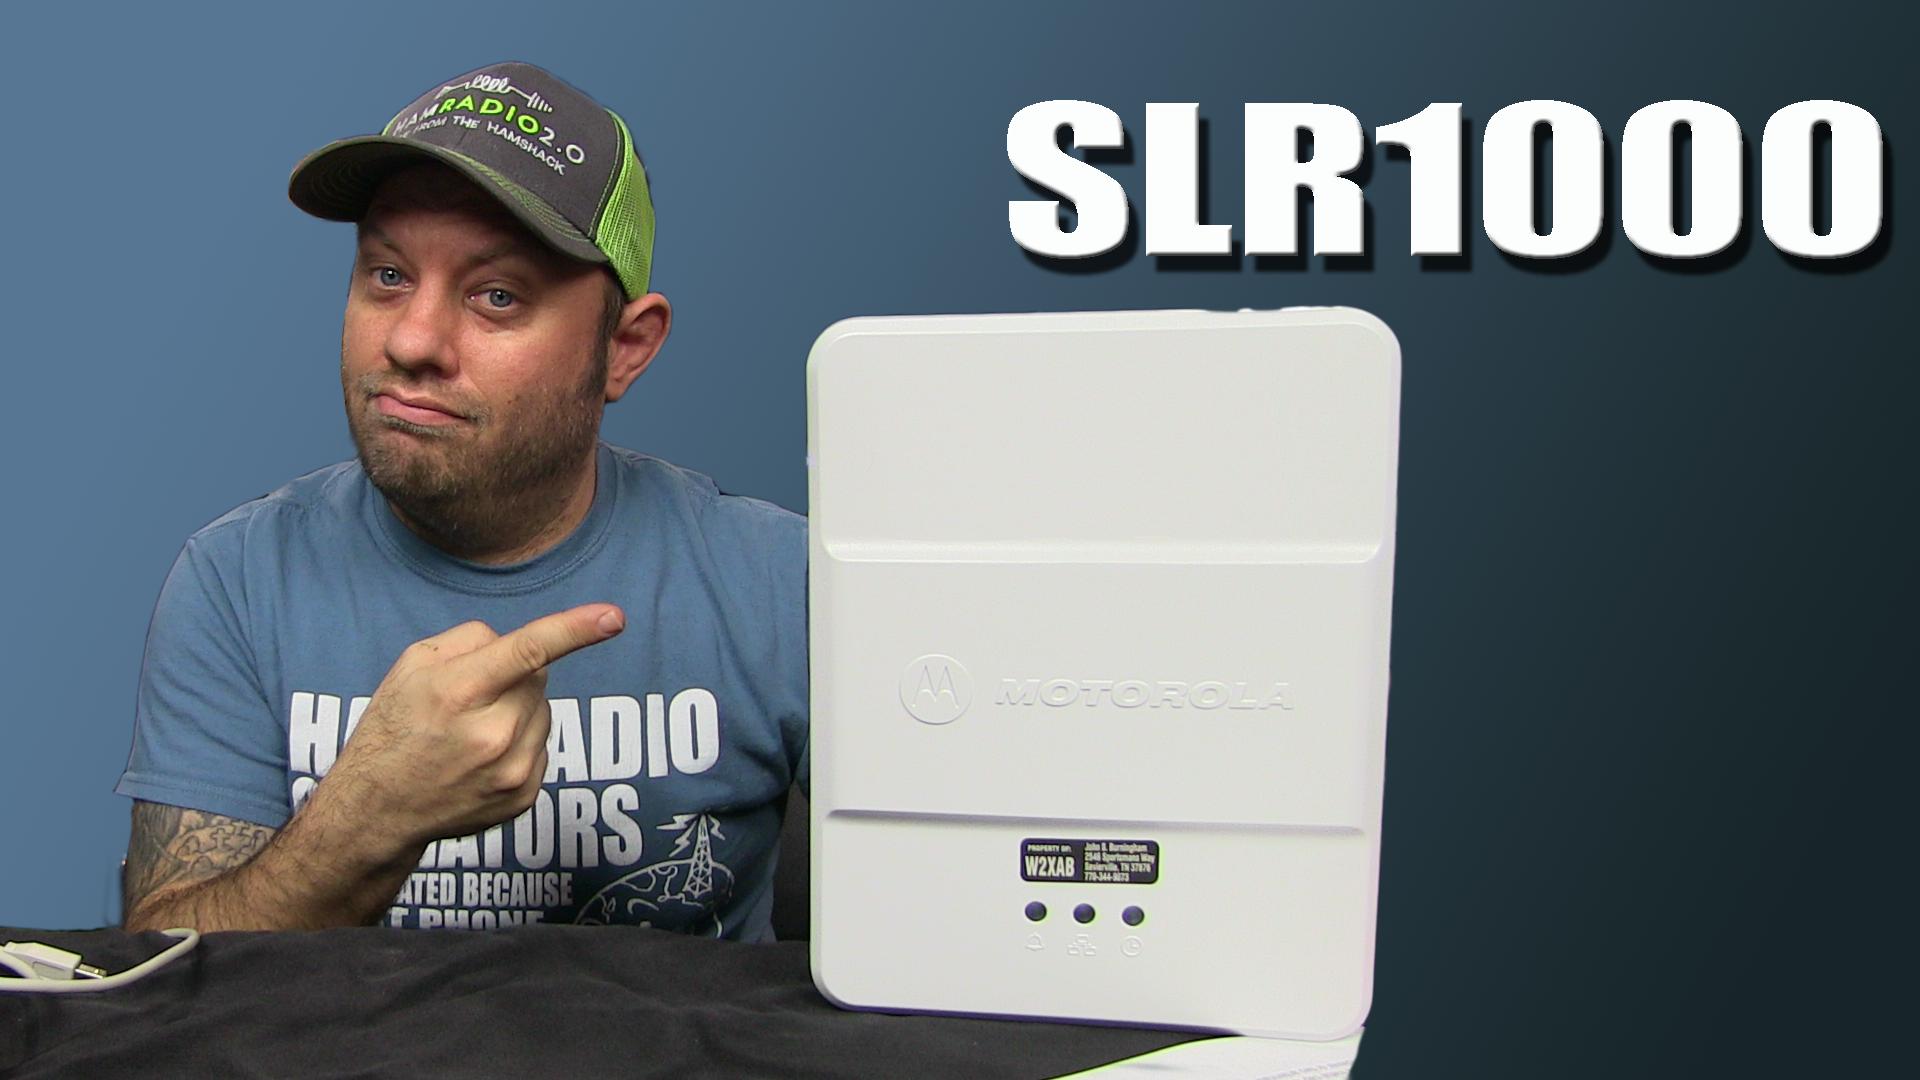 Episode 196: Motorola SLR1000 Repeater Connecting to a CBridge